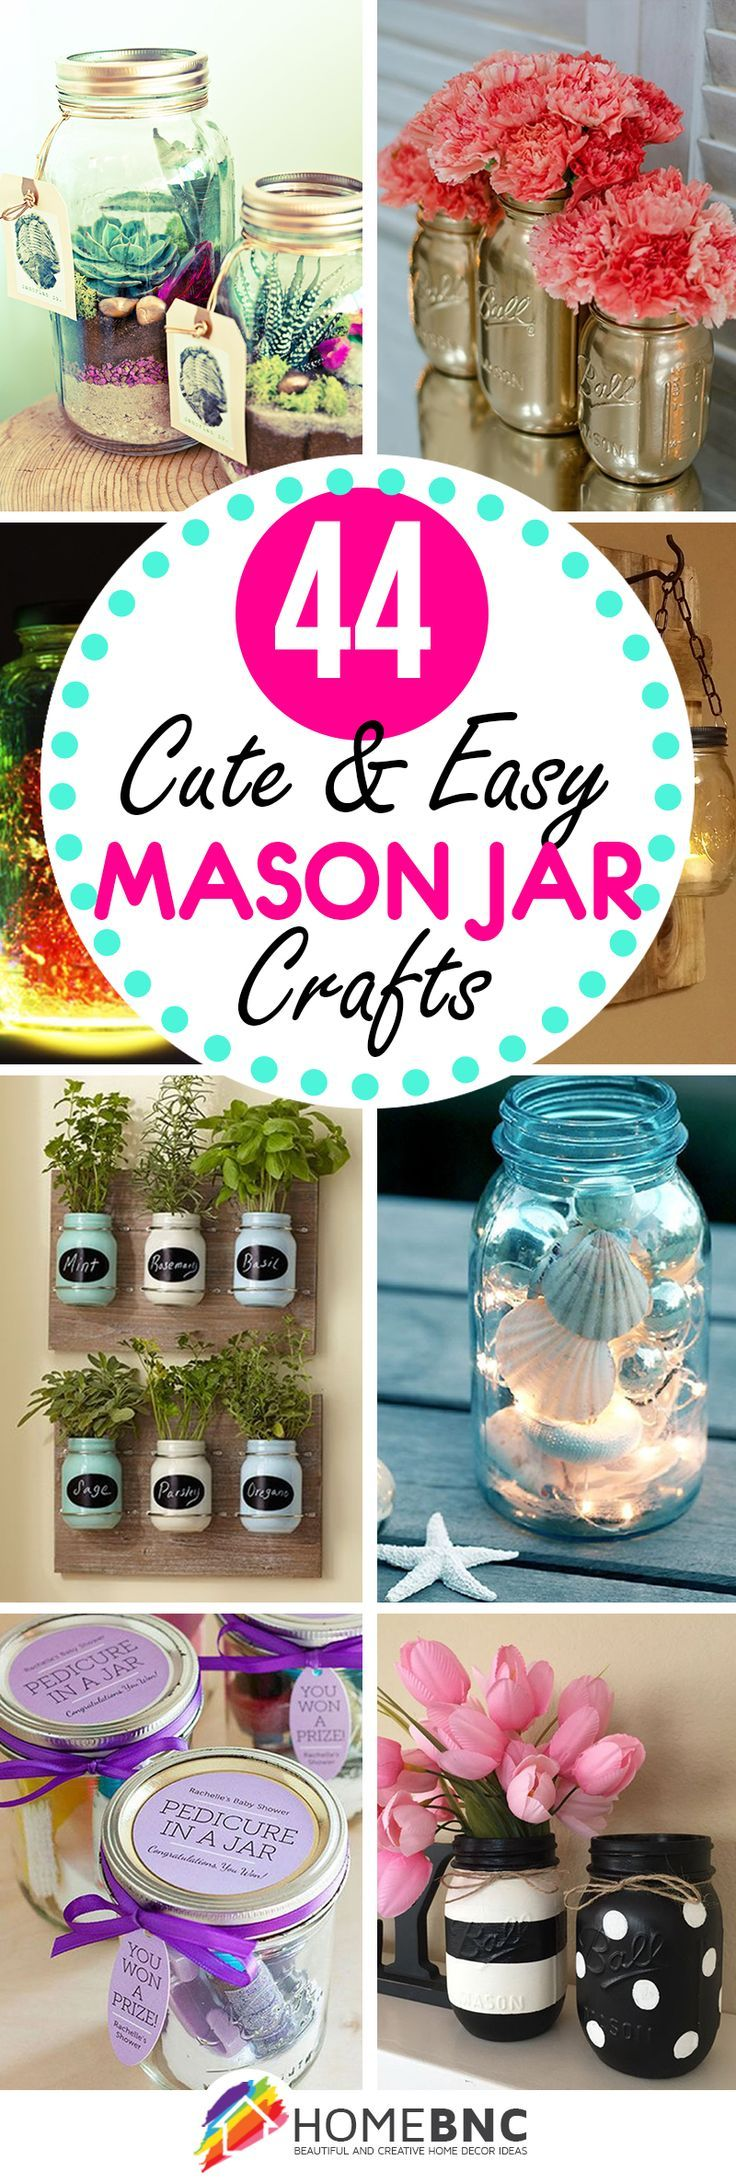 Get Creative With These 44 Diy Mason Jar Crafts Diy Jar Crafts